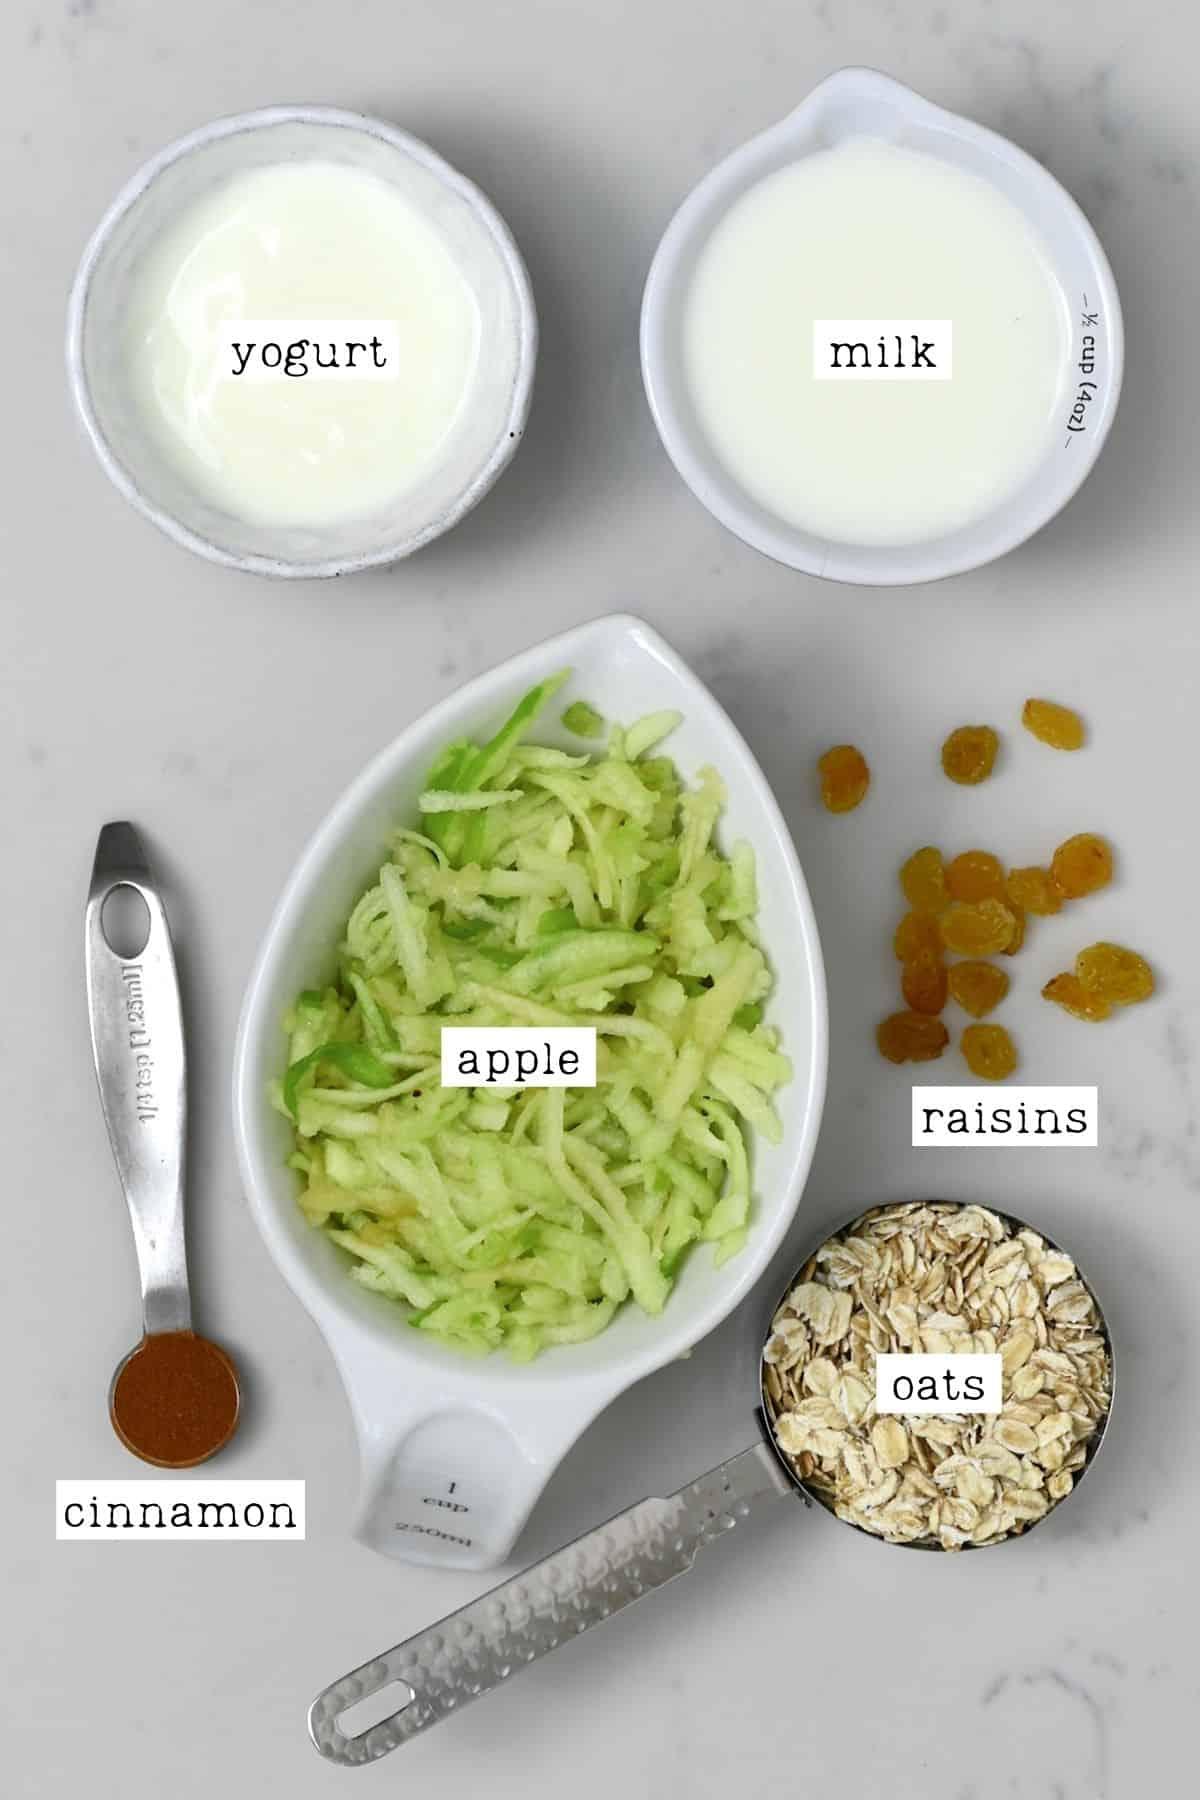 Ingredients for Bircher muesli